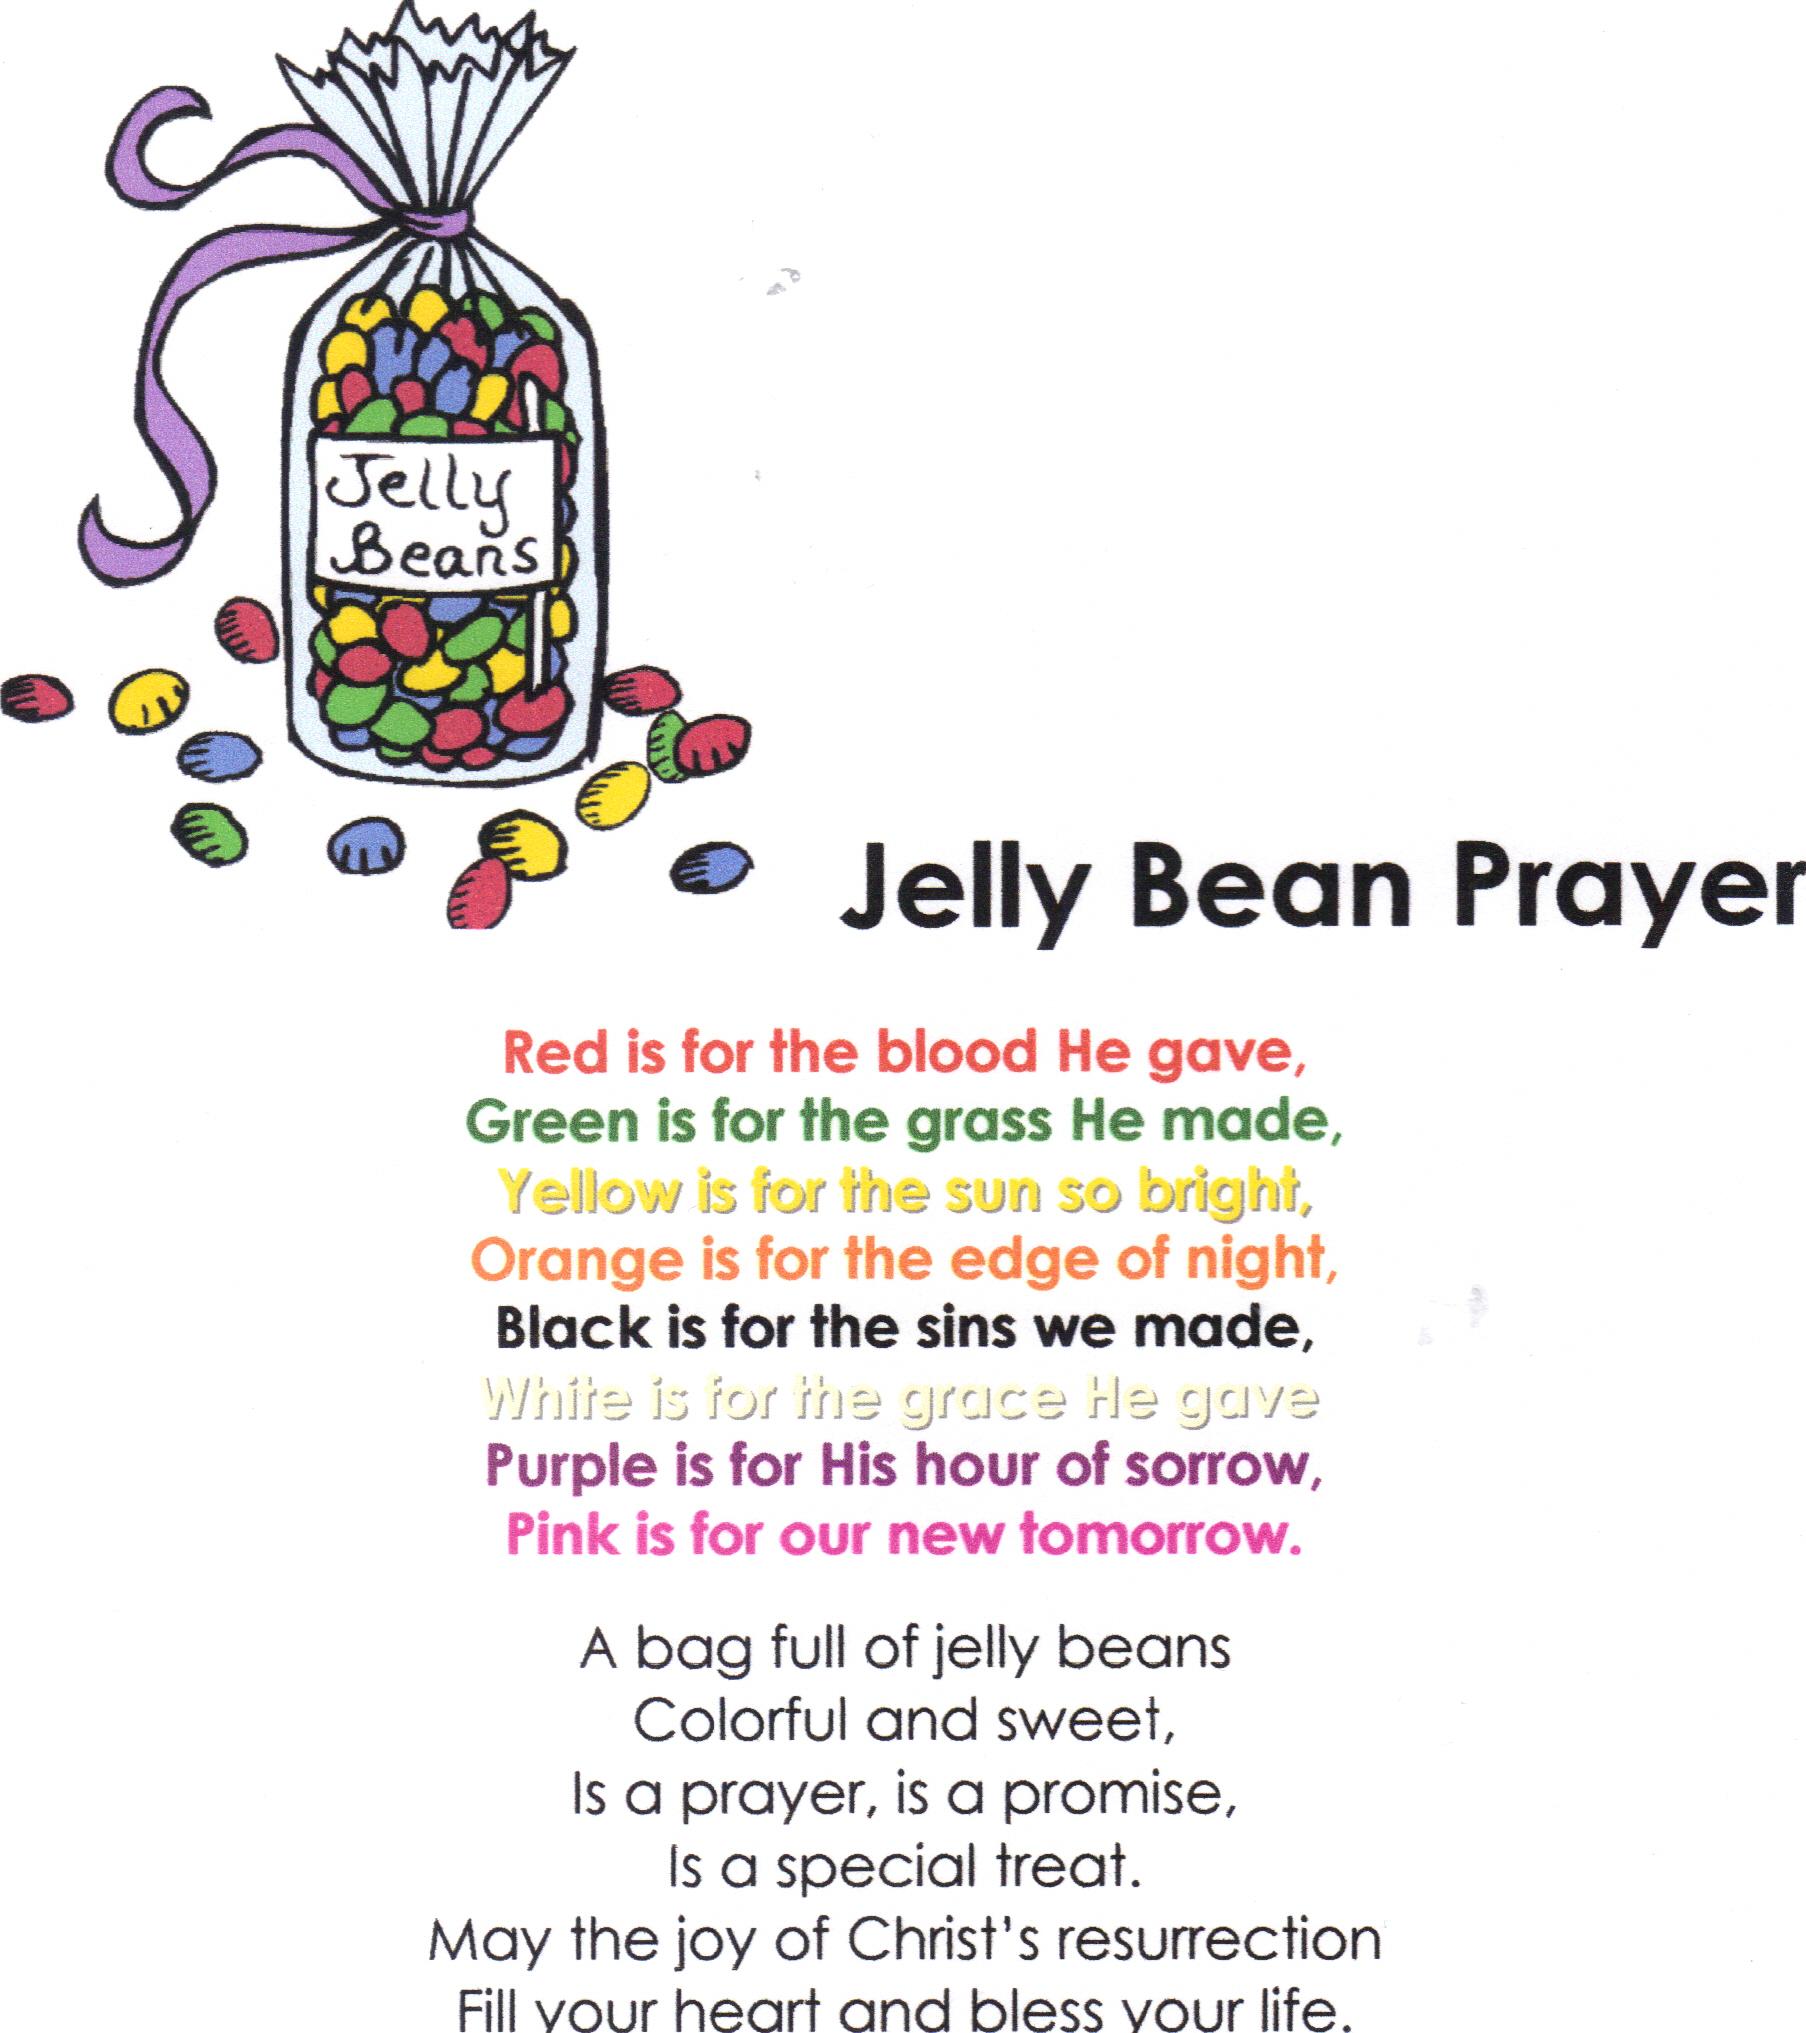 Jelly Bean Prayer